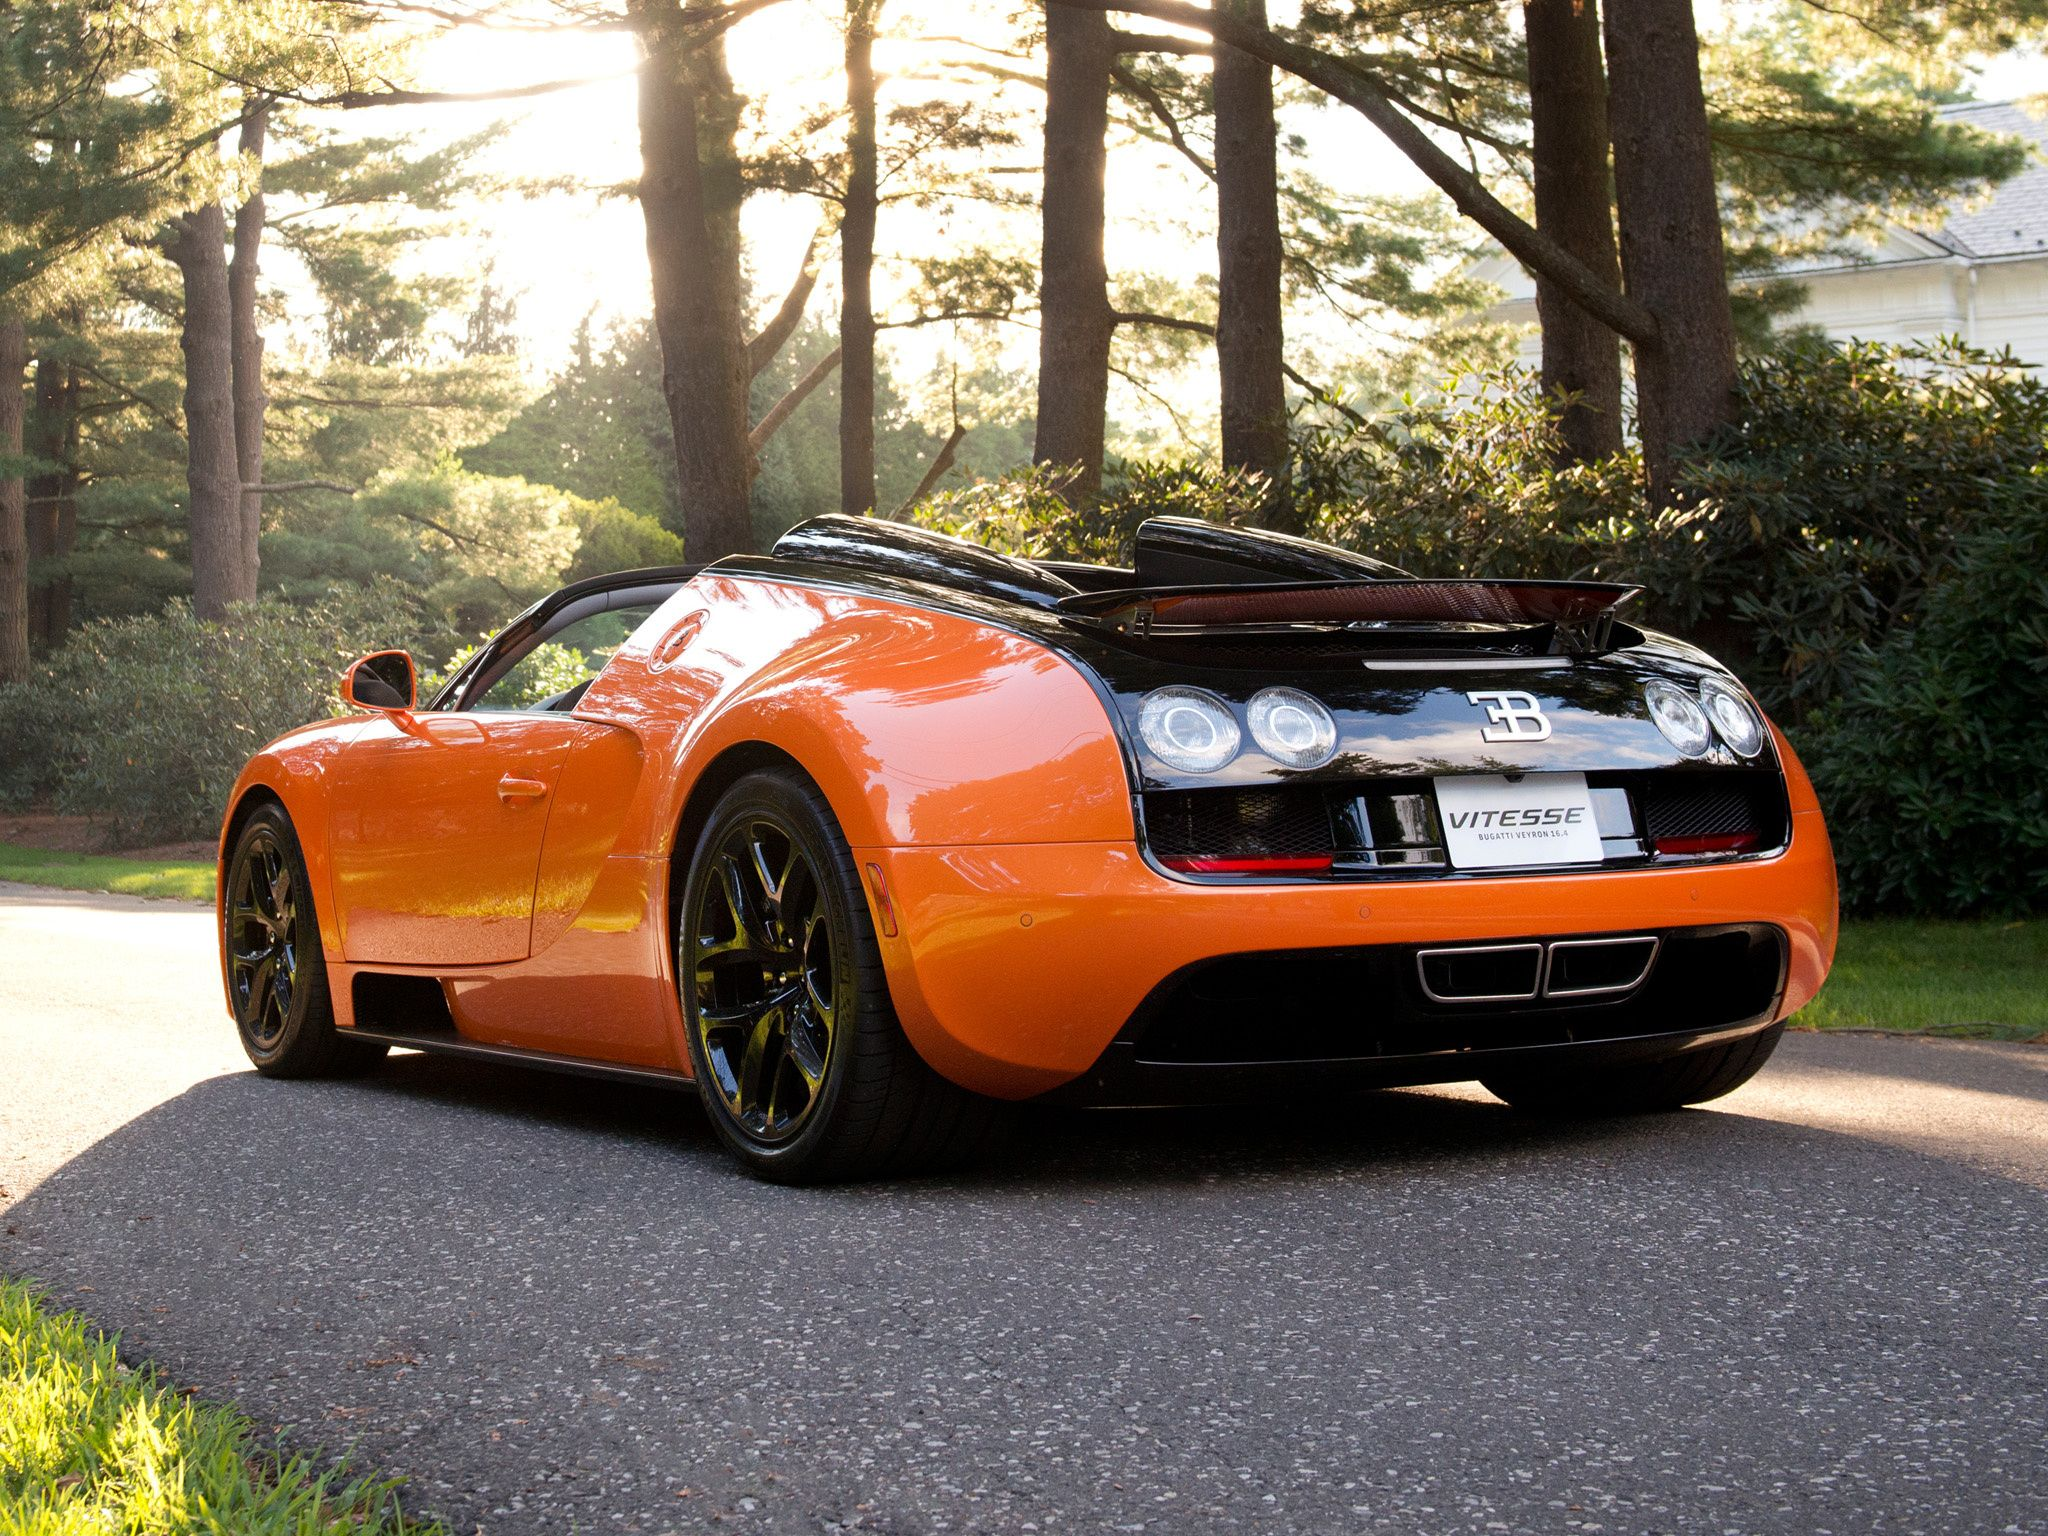 Top Viral Car Videos Of The Week - Bugatti Veyron Vitesse vs Pagani Huayra